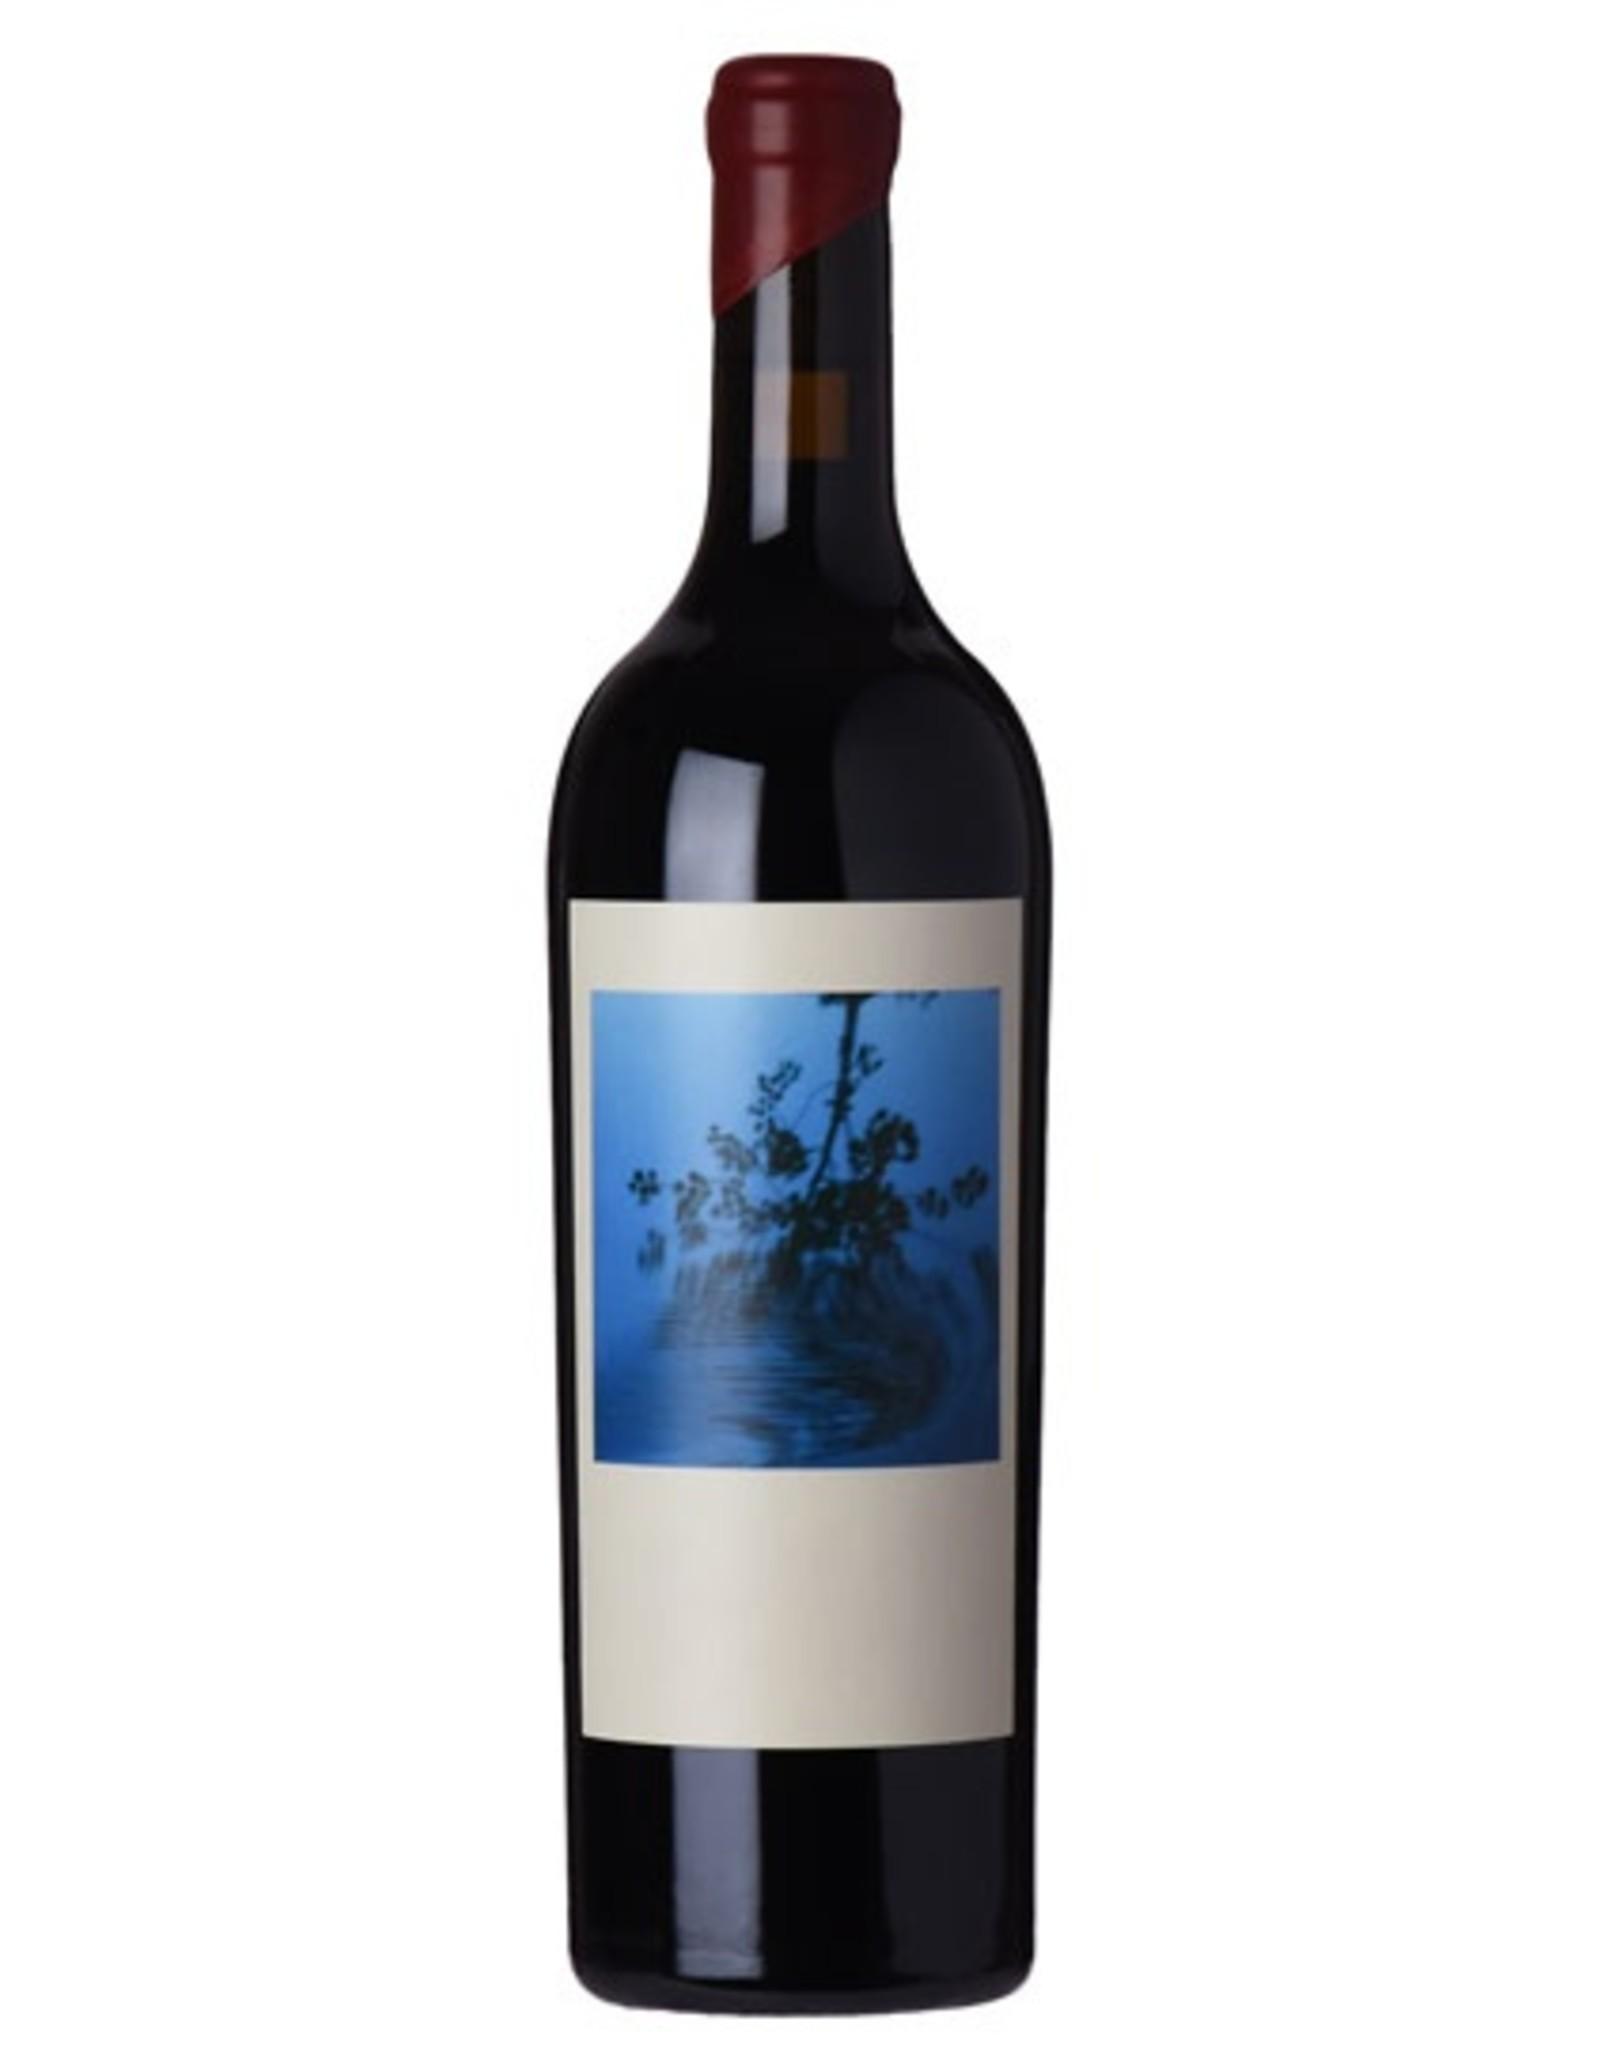 Red Wine 2014, Sine Qua Non Piranha Waterdance, Syrah, Ventura, Central Coast, California, 15.8% Alc, CT95, RP100